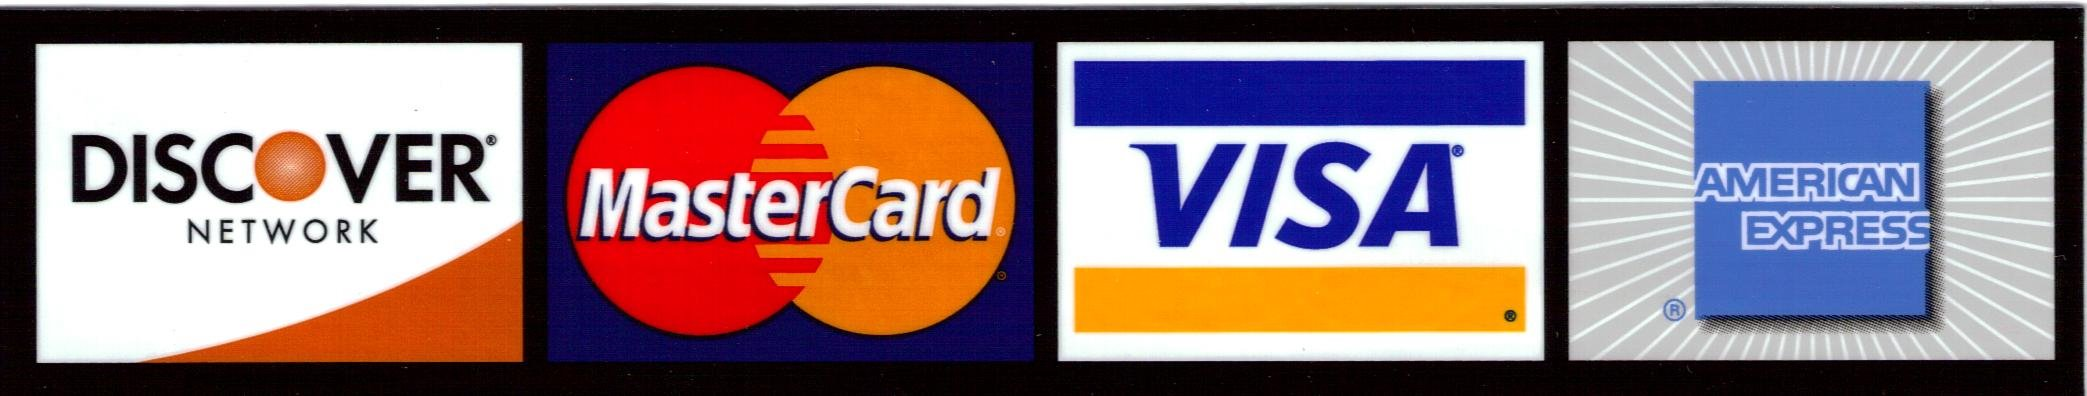 visa-master-disc-amex.jpg